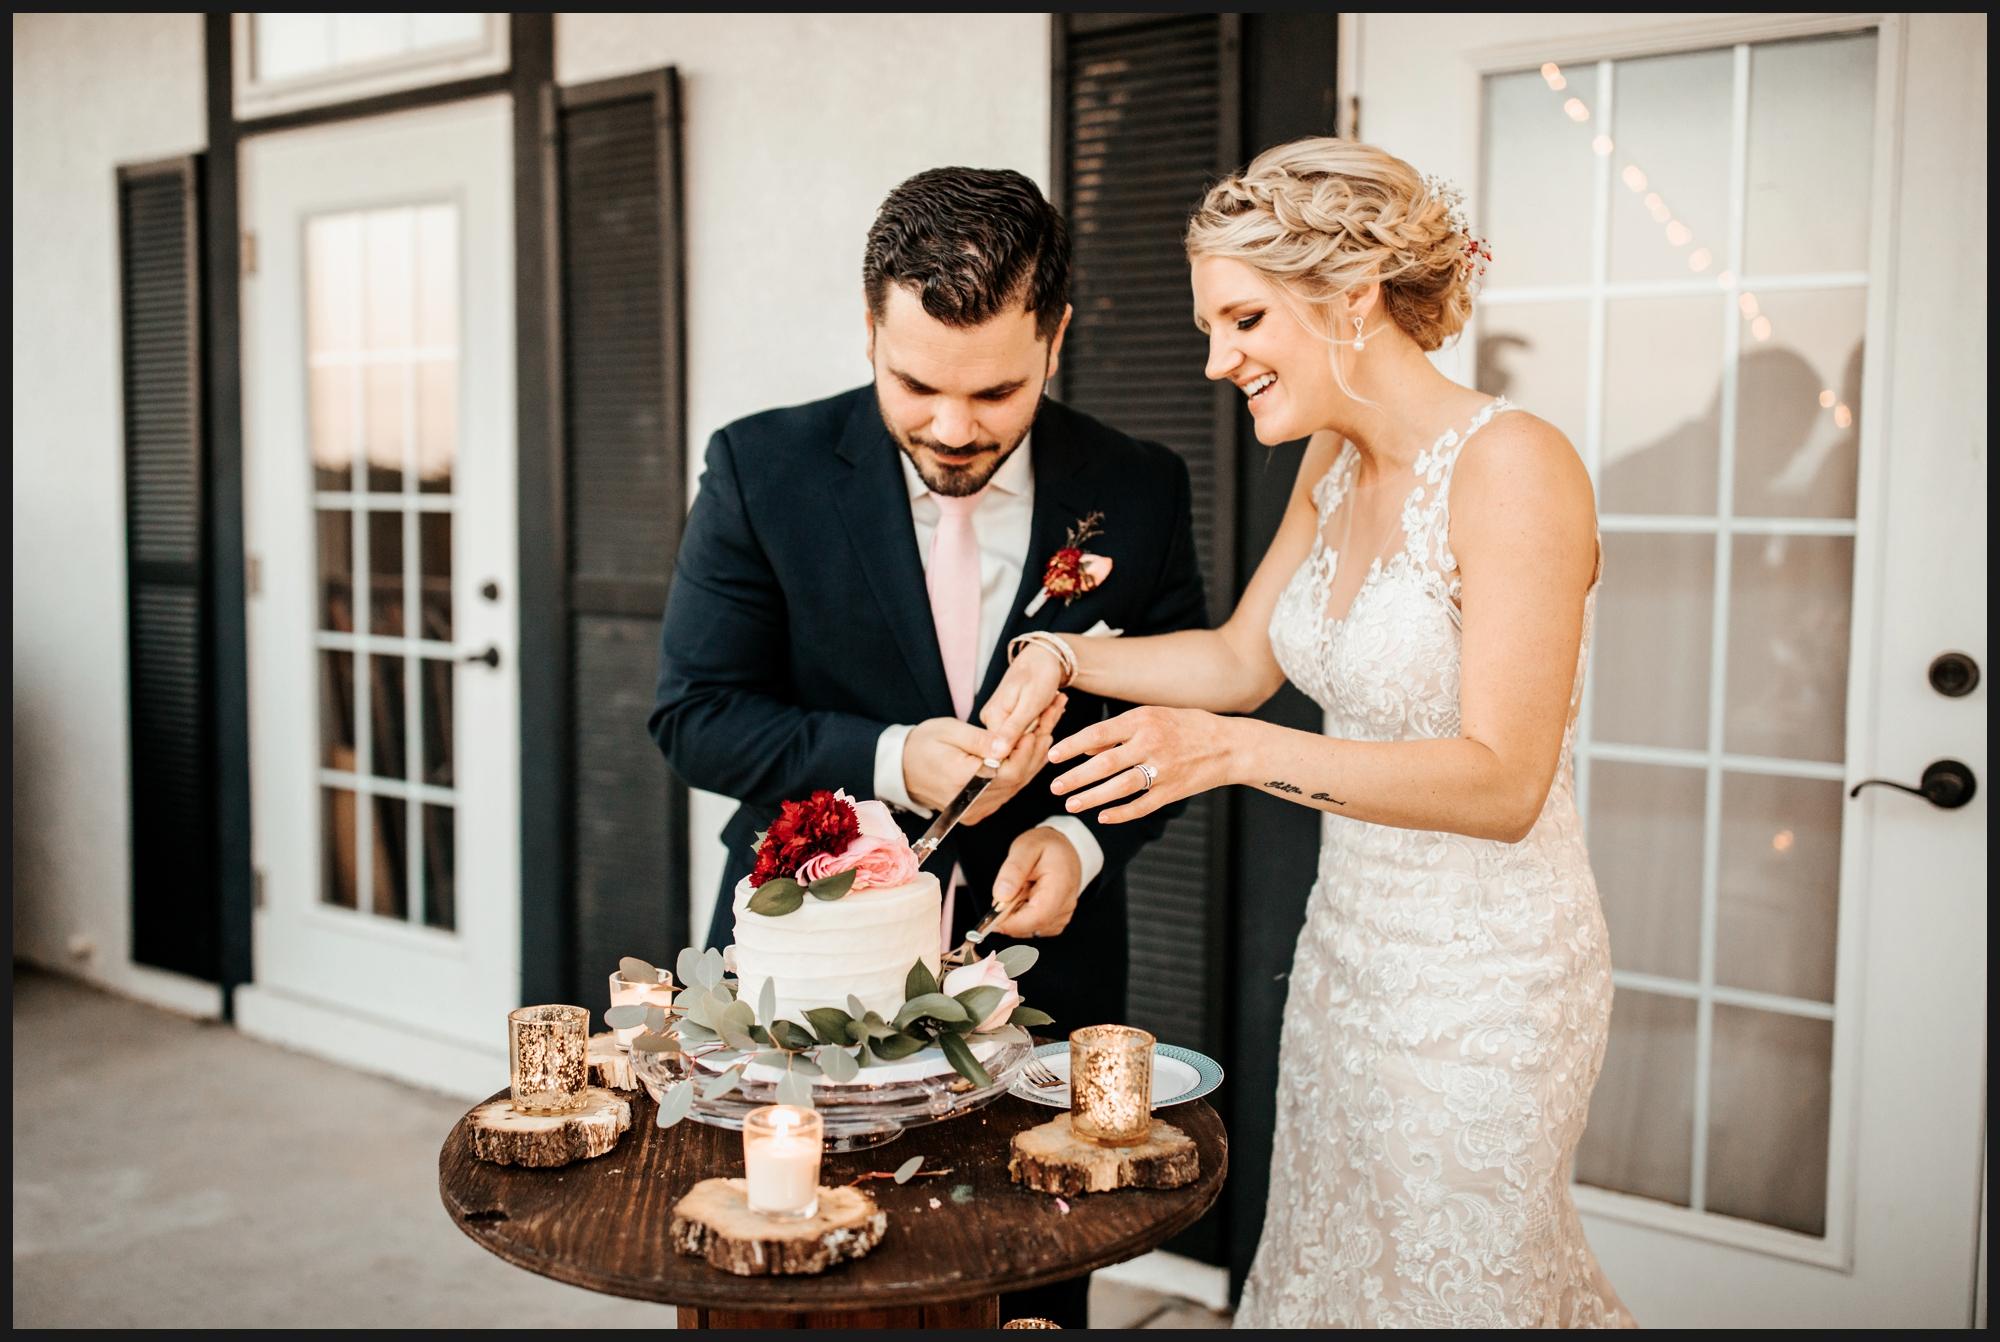 Orlando-Wedding-Photographer-destination-wedding-photographer-florida-wedding-photographer-hawaii-wedding-photographer_0621.jpg